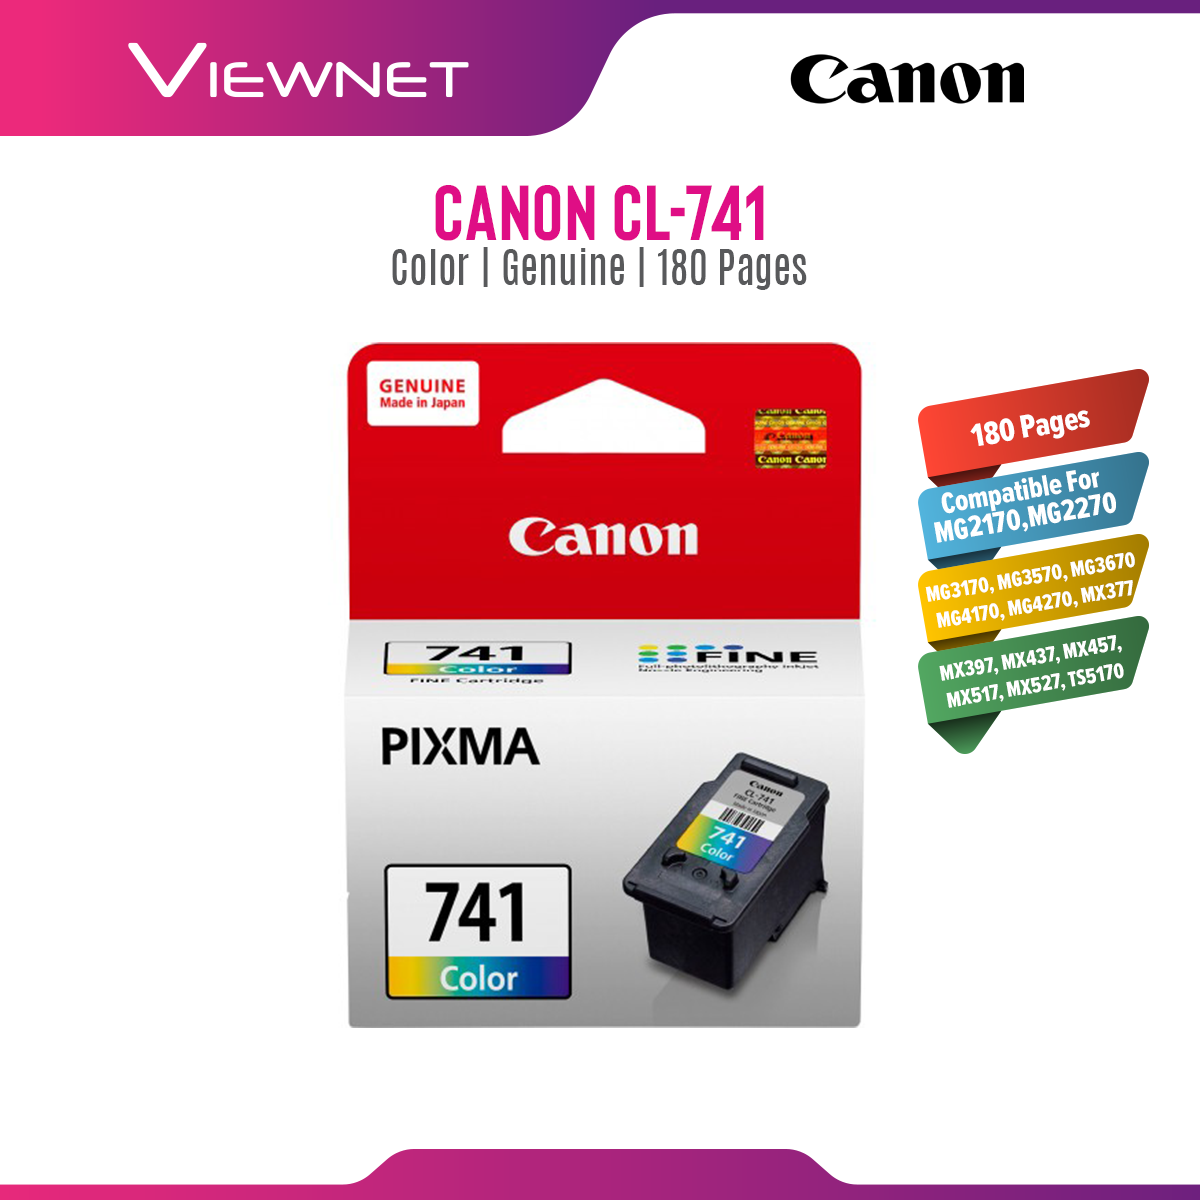 Canon PG-740 / CL-741 Original Ink Cartridge Black / Color